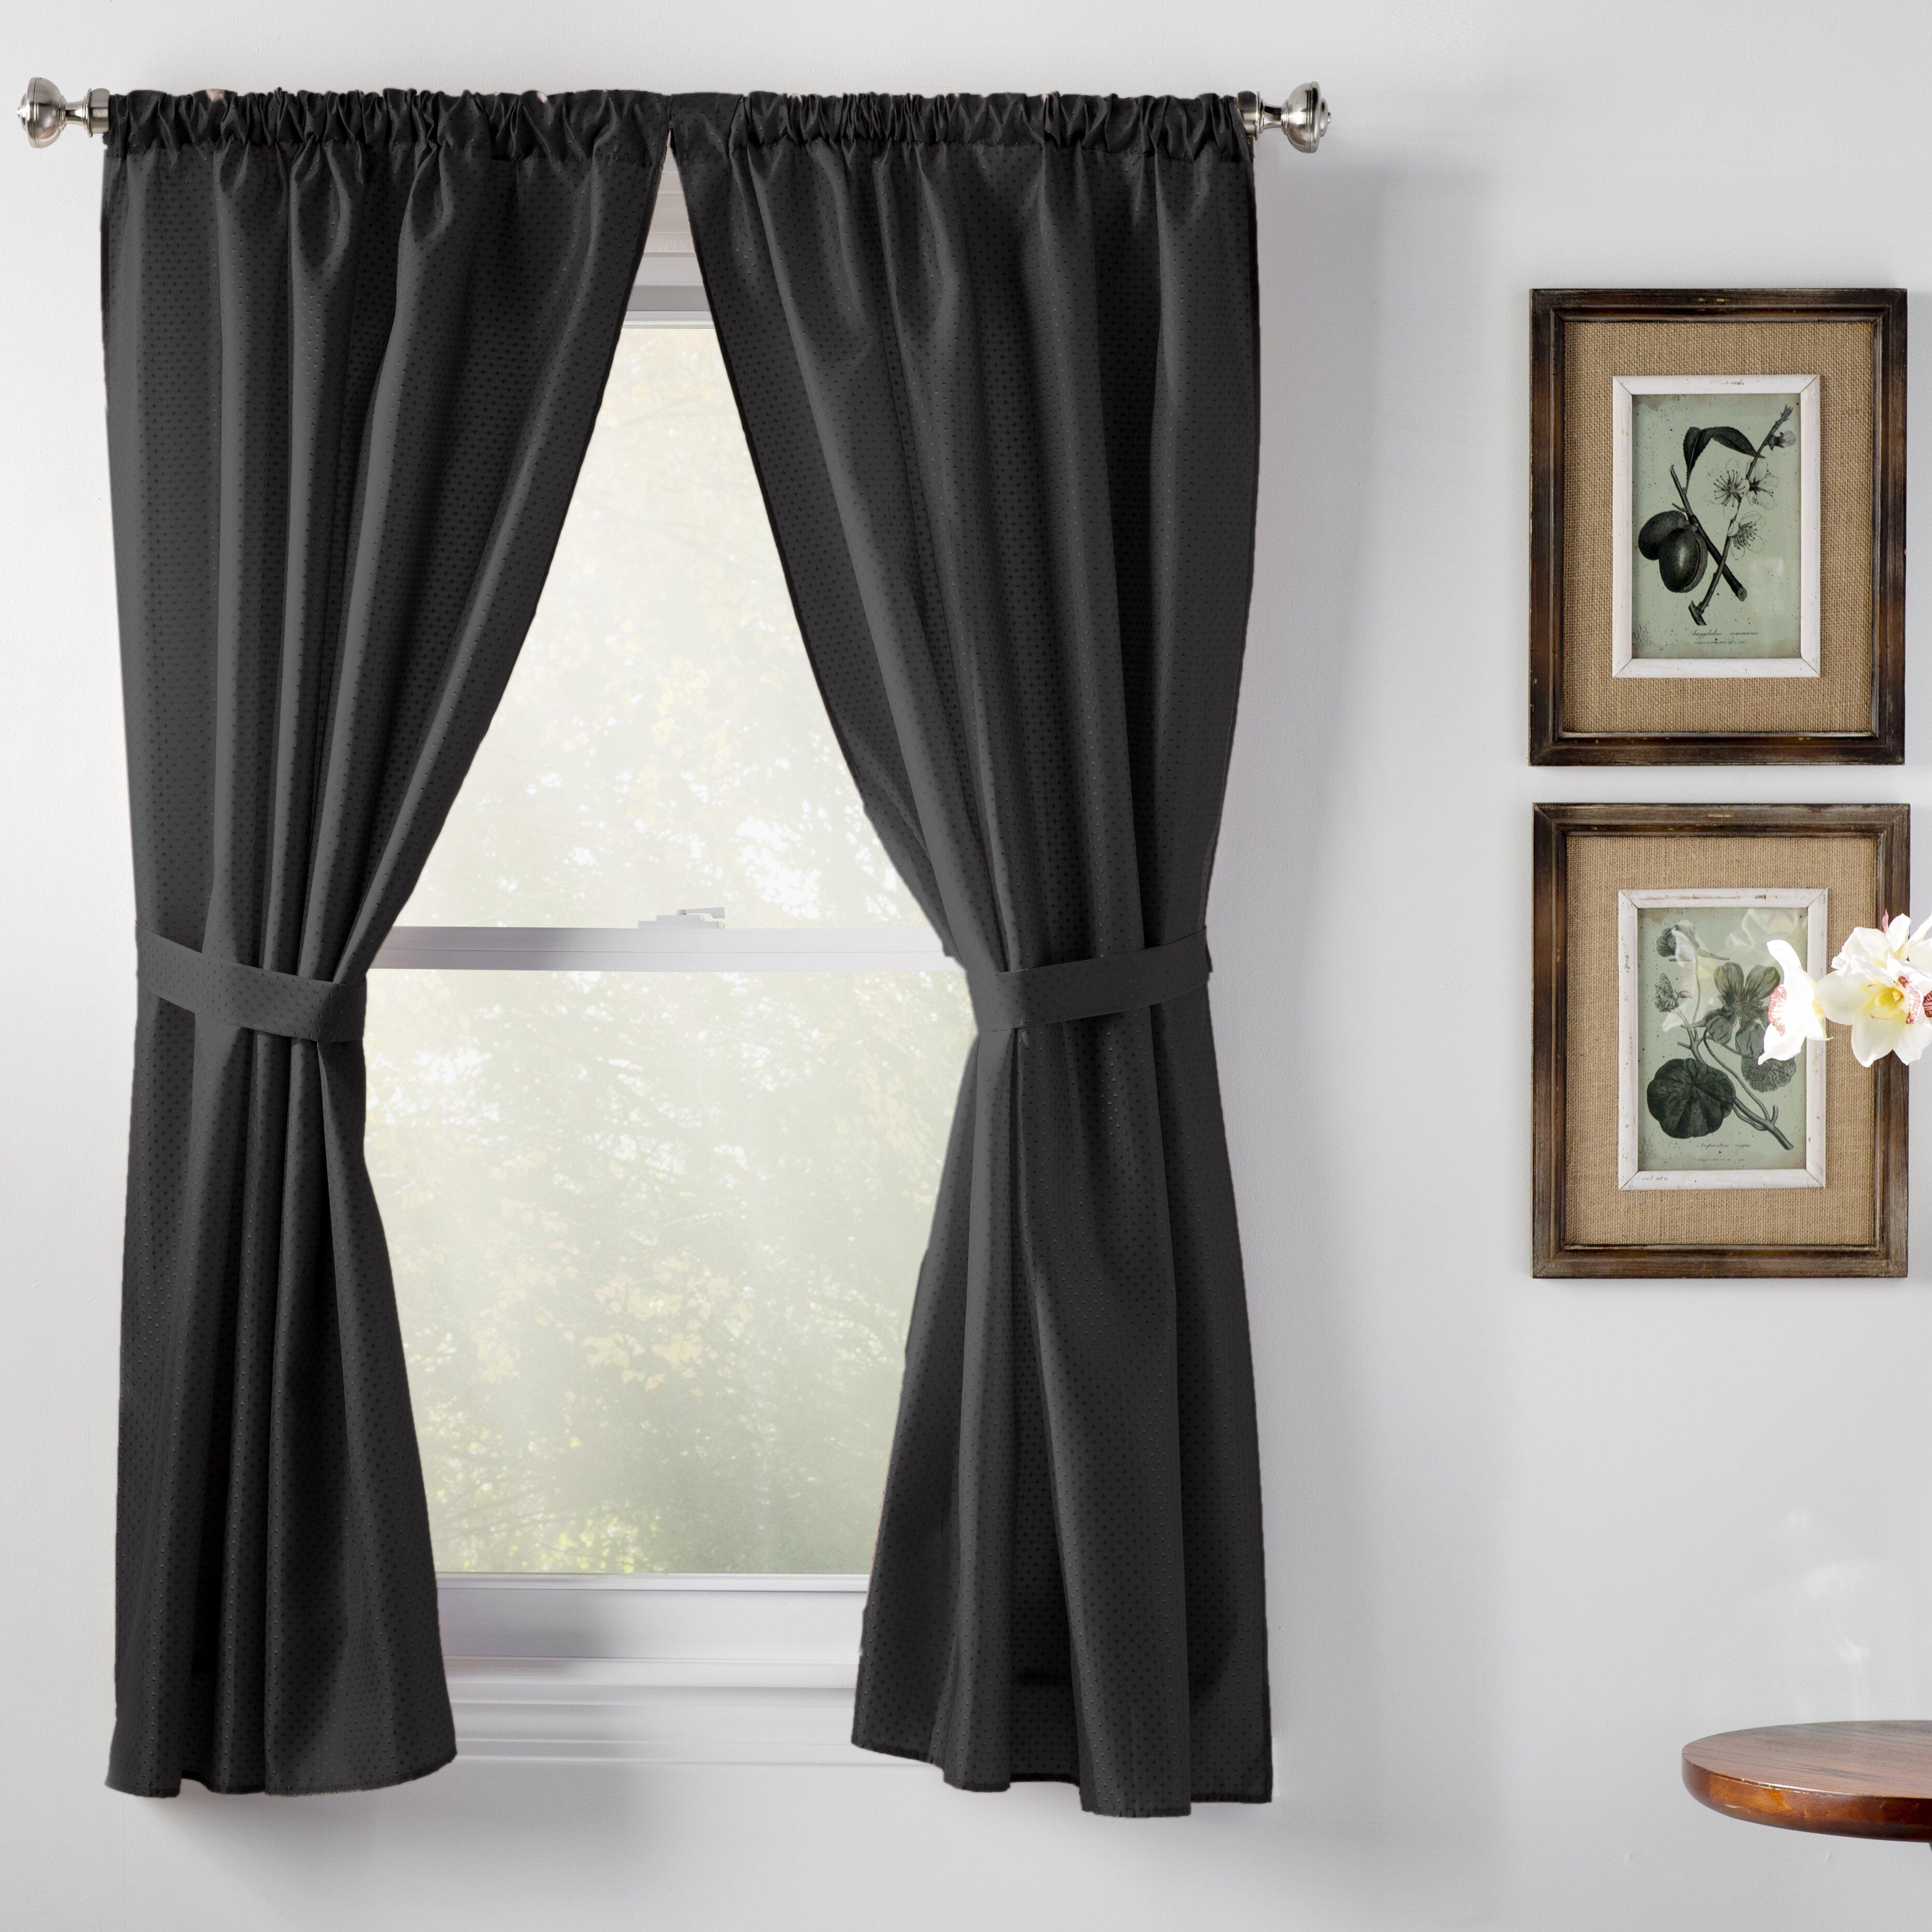 Wayfair Basics Wayfair Basics Rod Pocket Curtain Panel